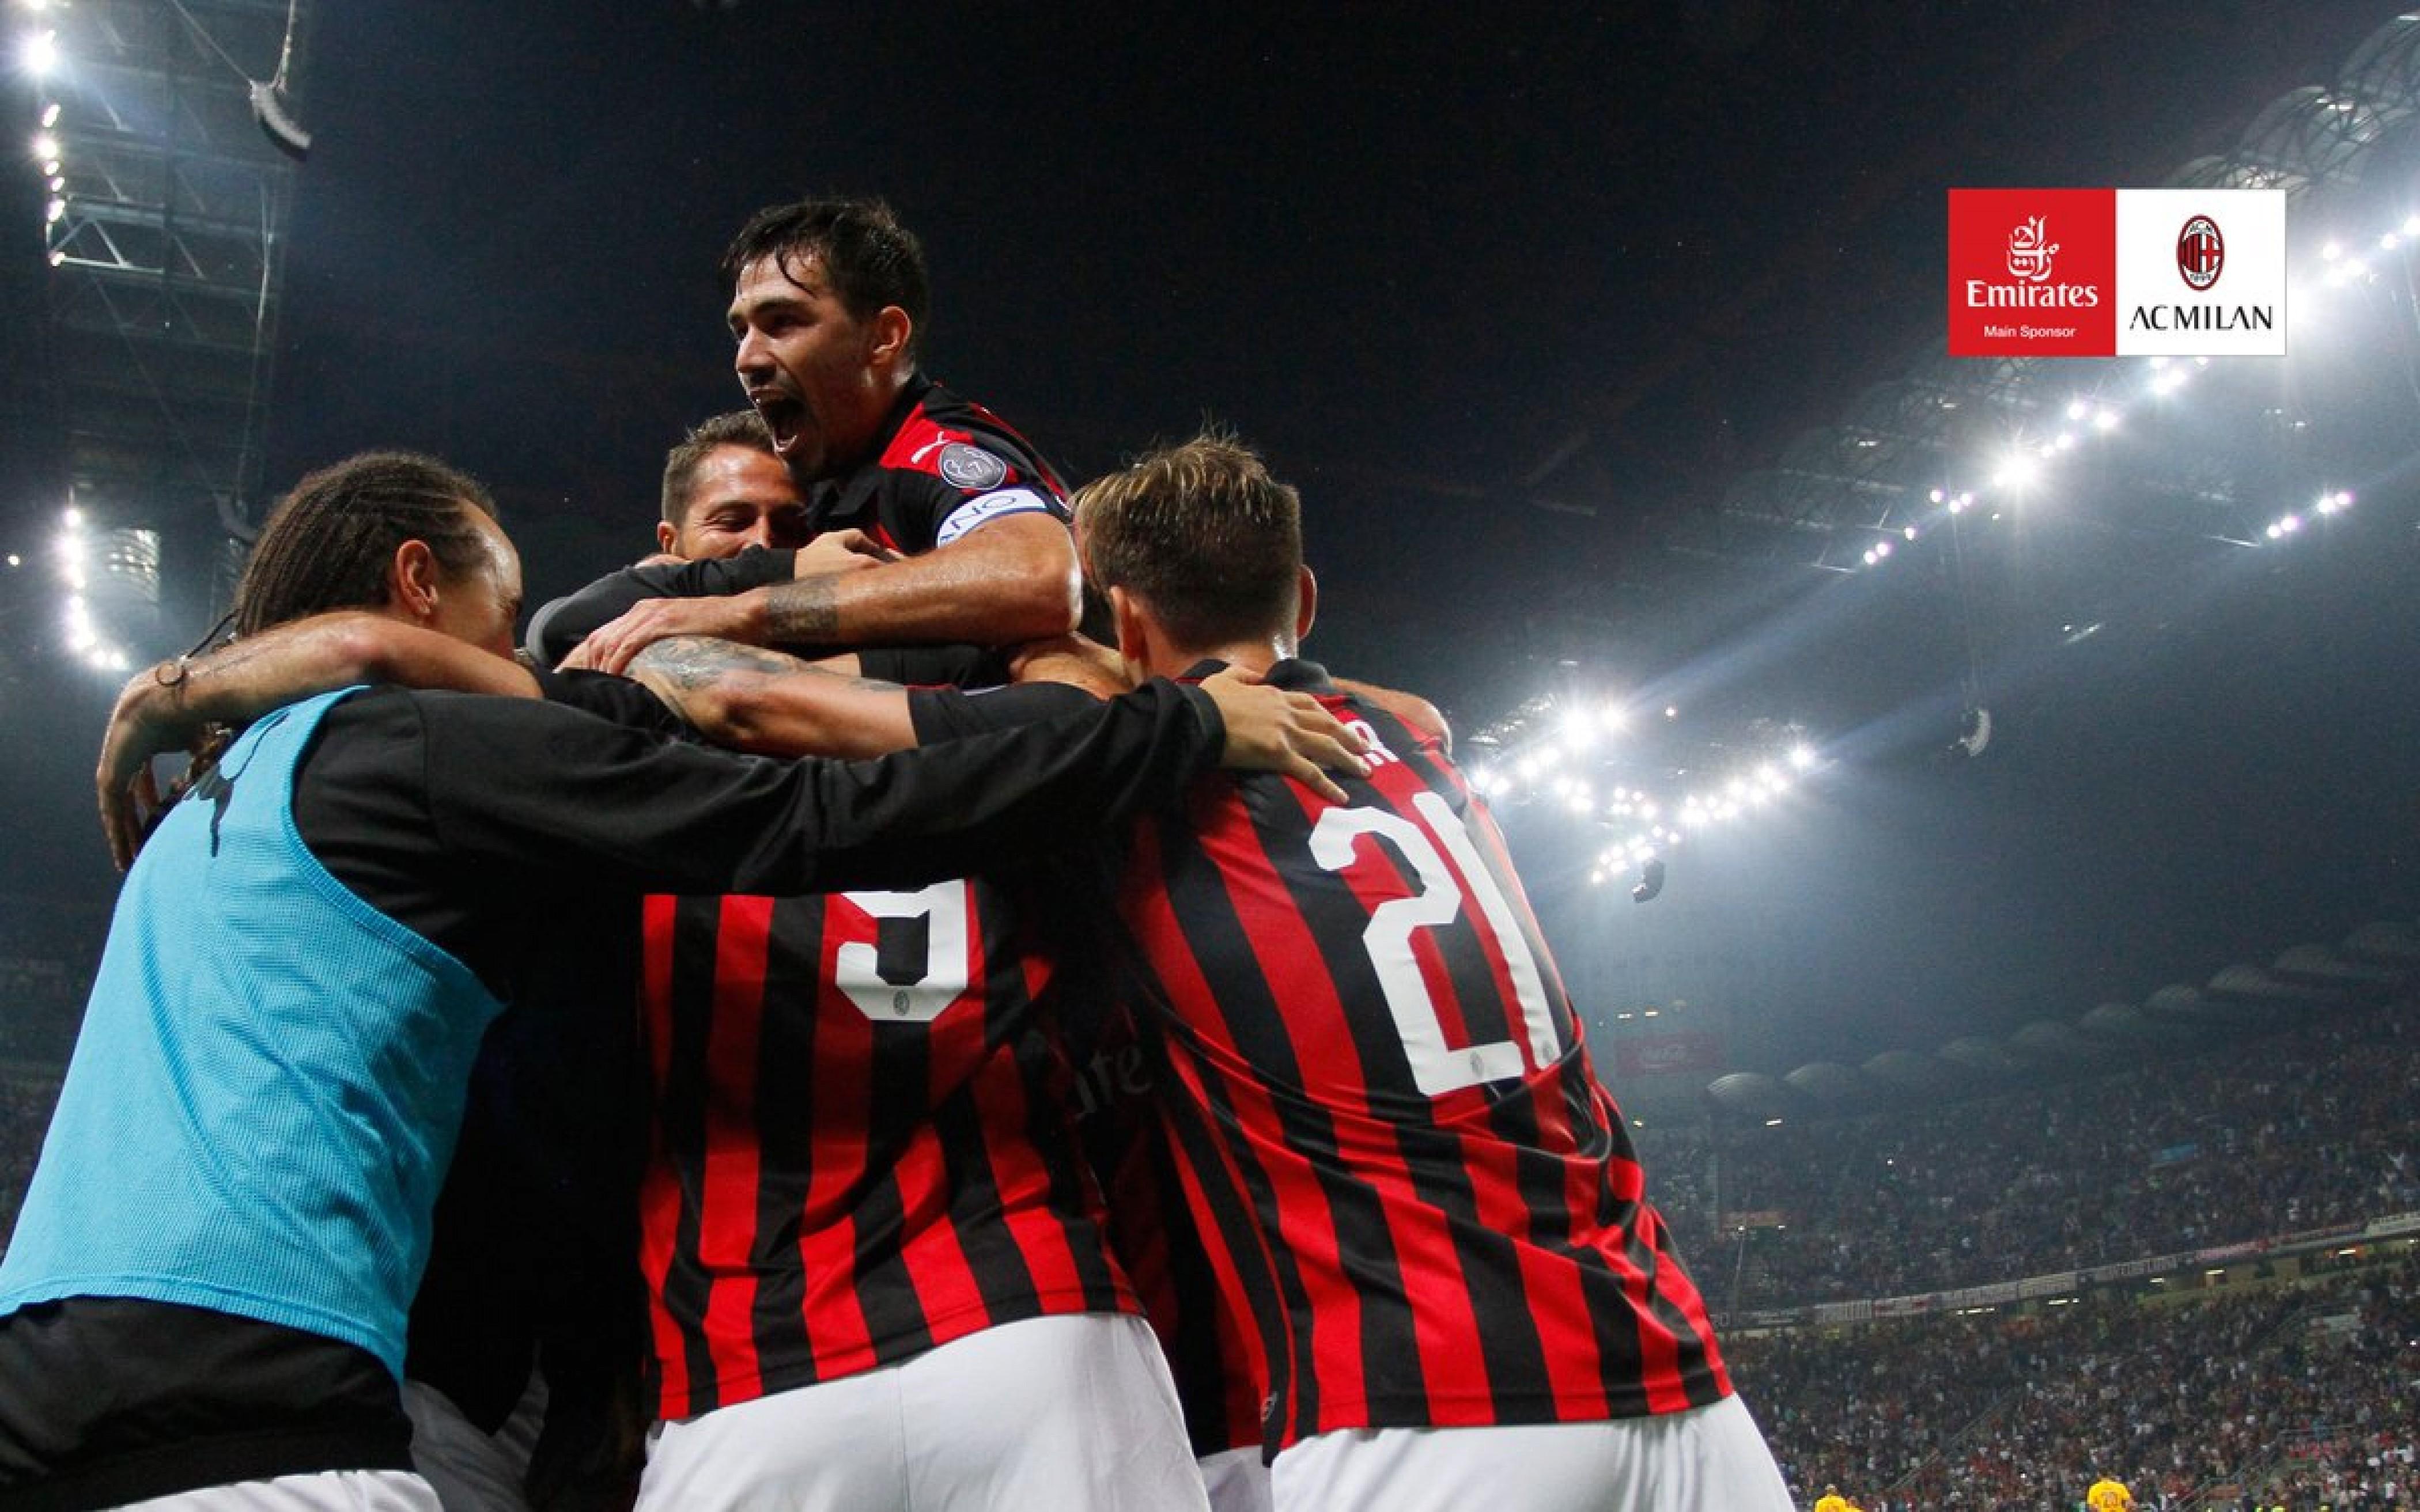 Cagliari-Milan in diretta, Serie A 2018/19 LIVE (1-1): PARI ALLA SARDEGNA ARENA